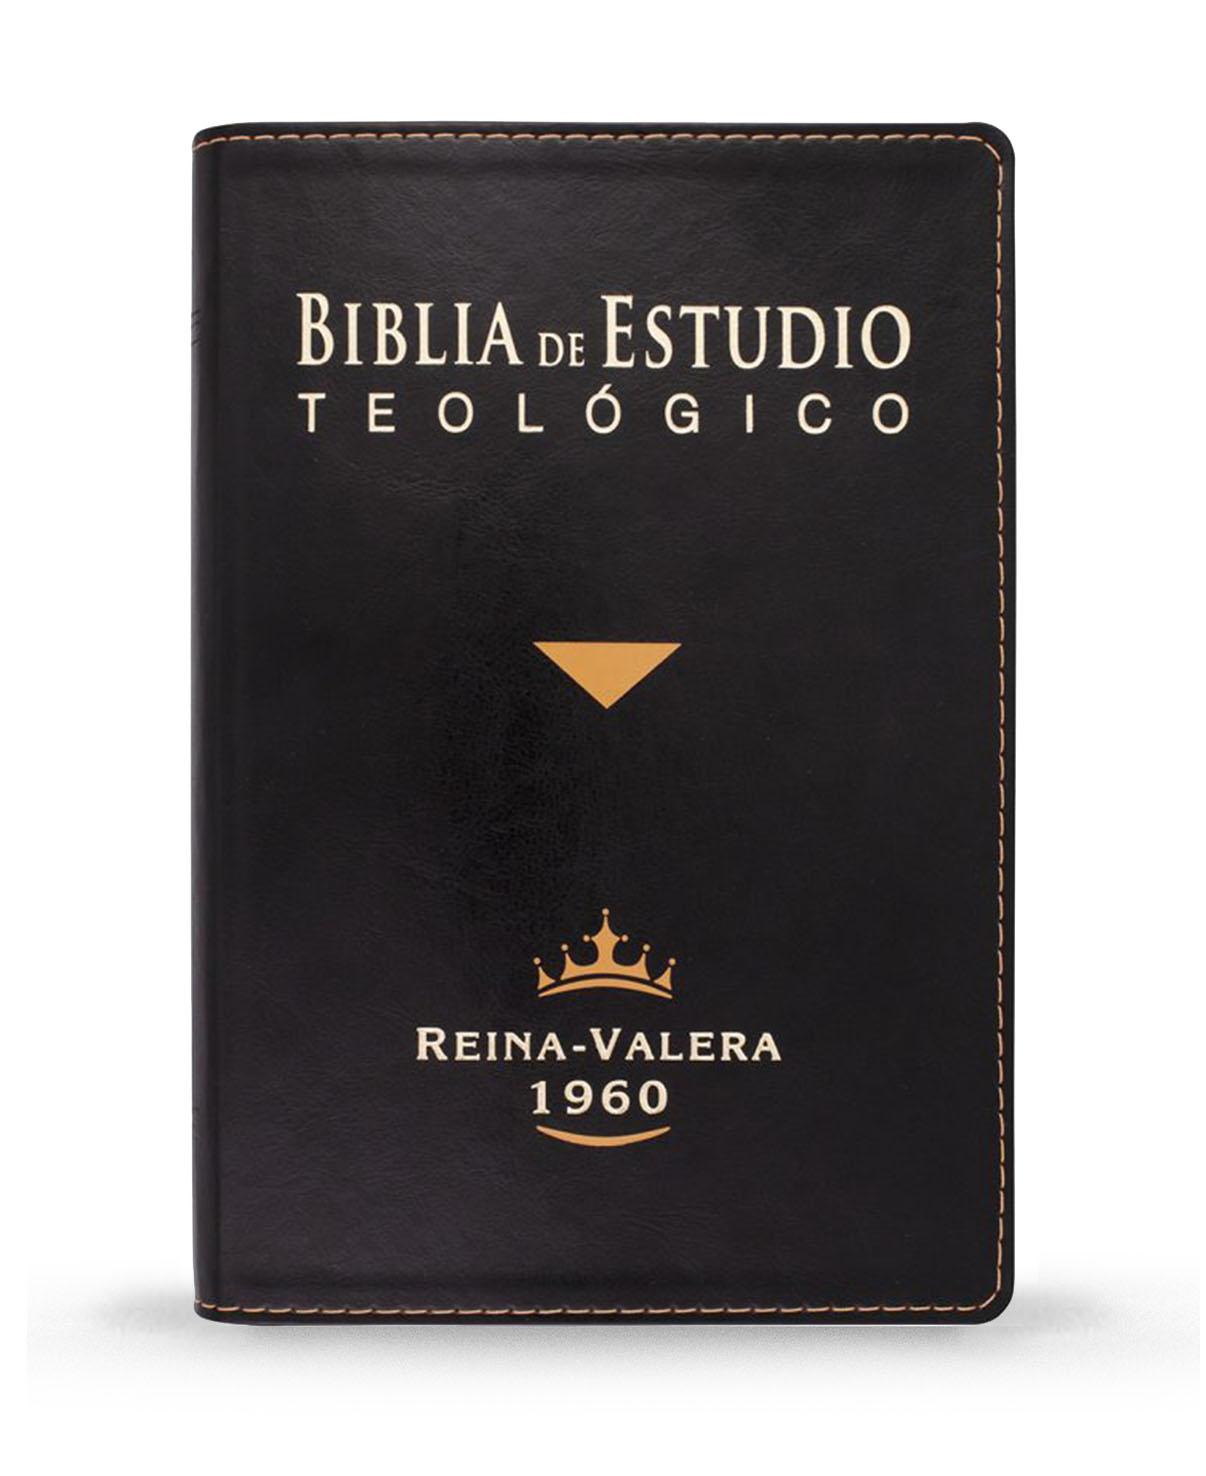 Biblia de Estudio Teológico RVR1960